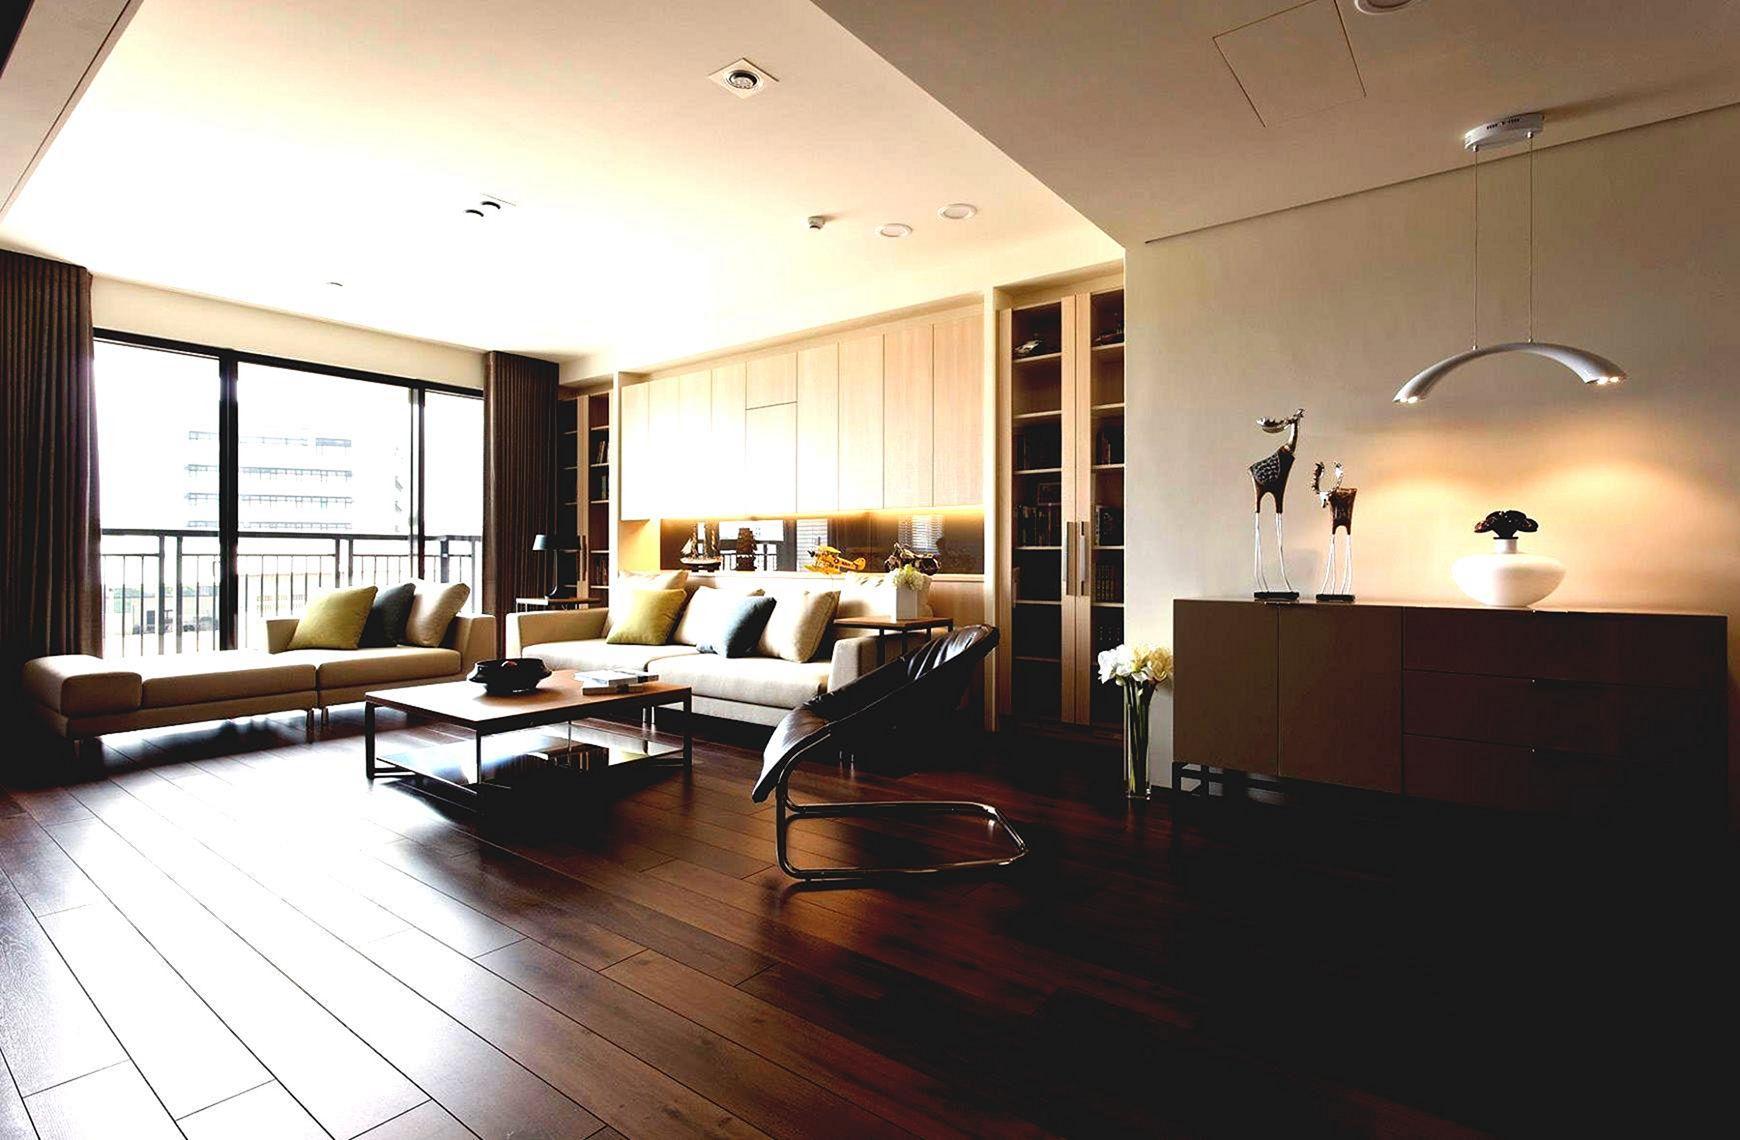 Apartments Studio Design With Wood Floor